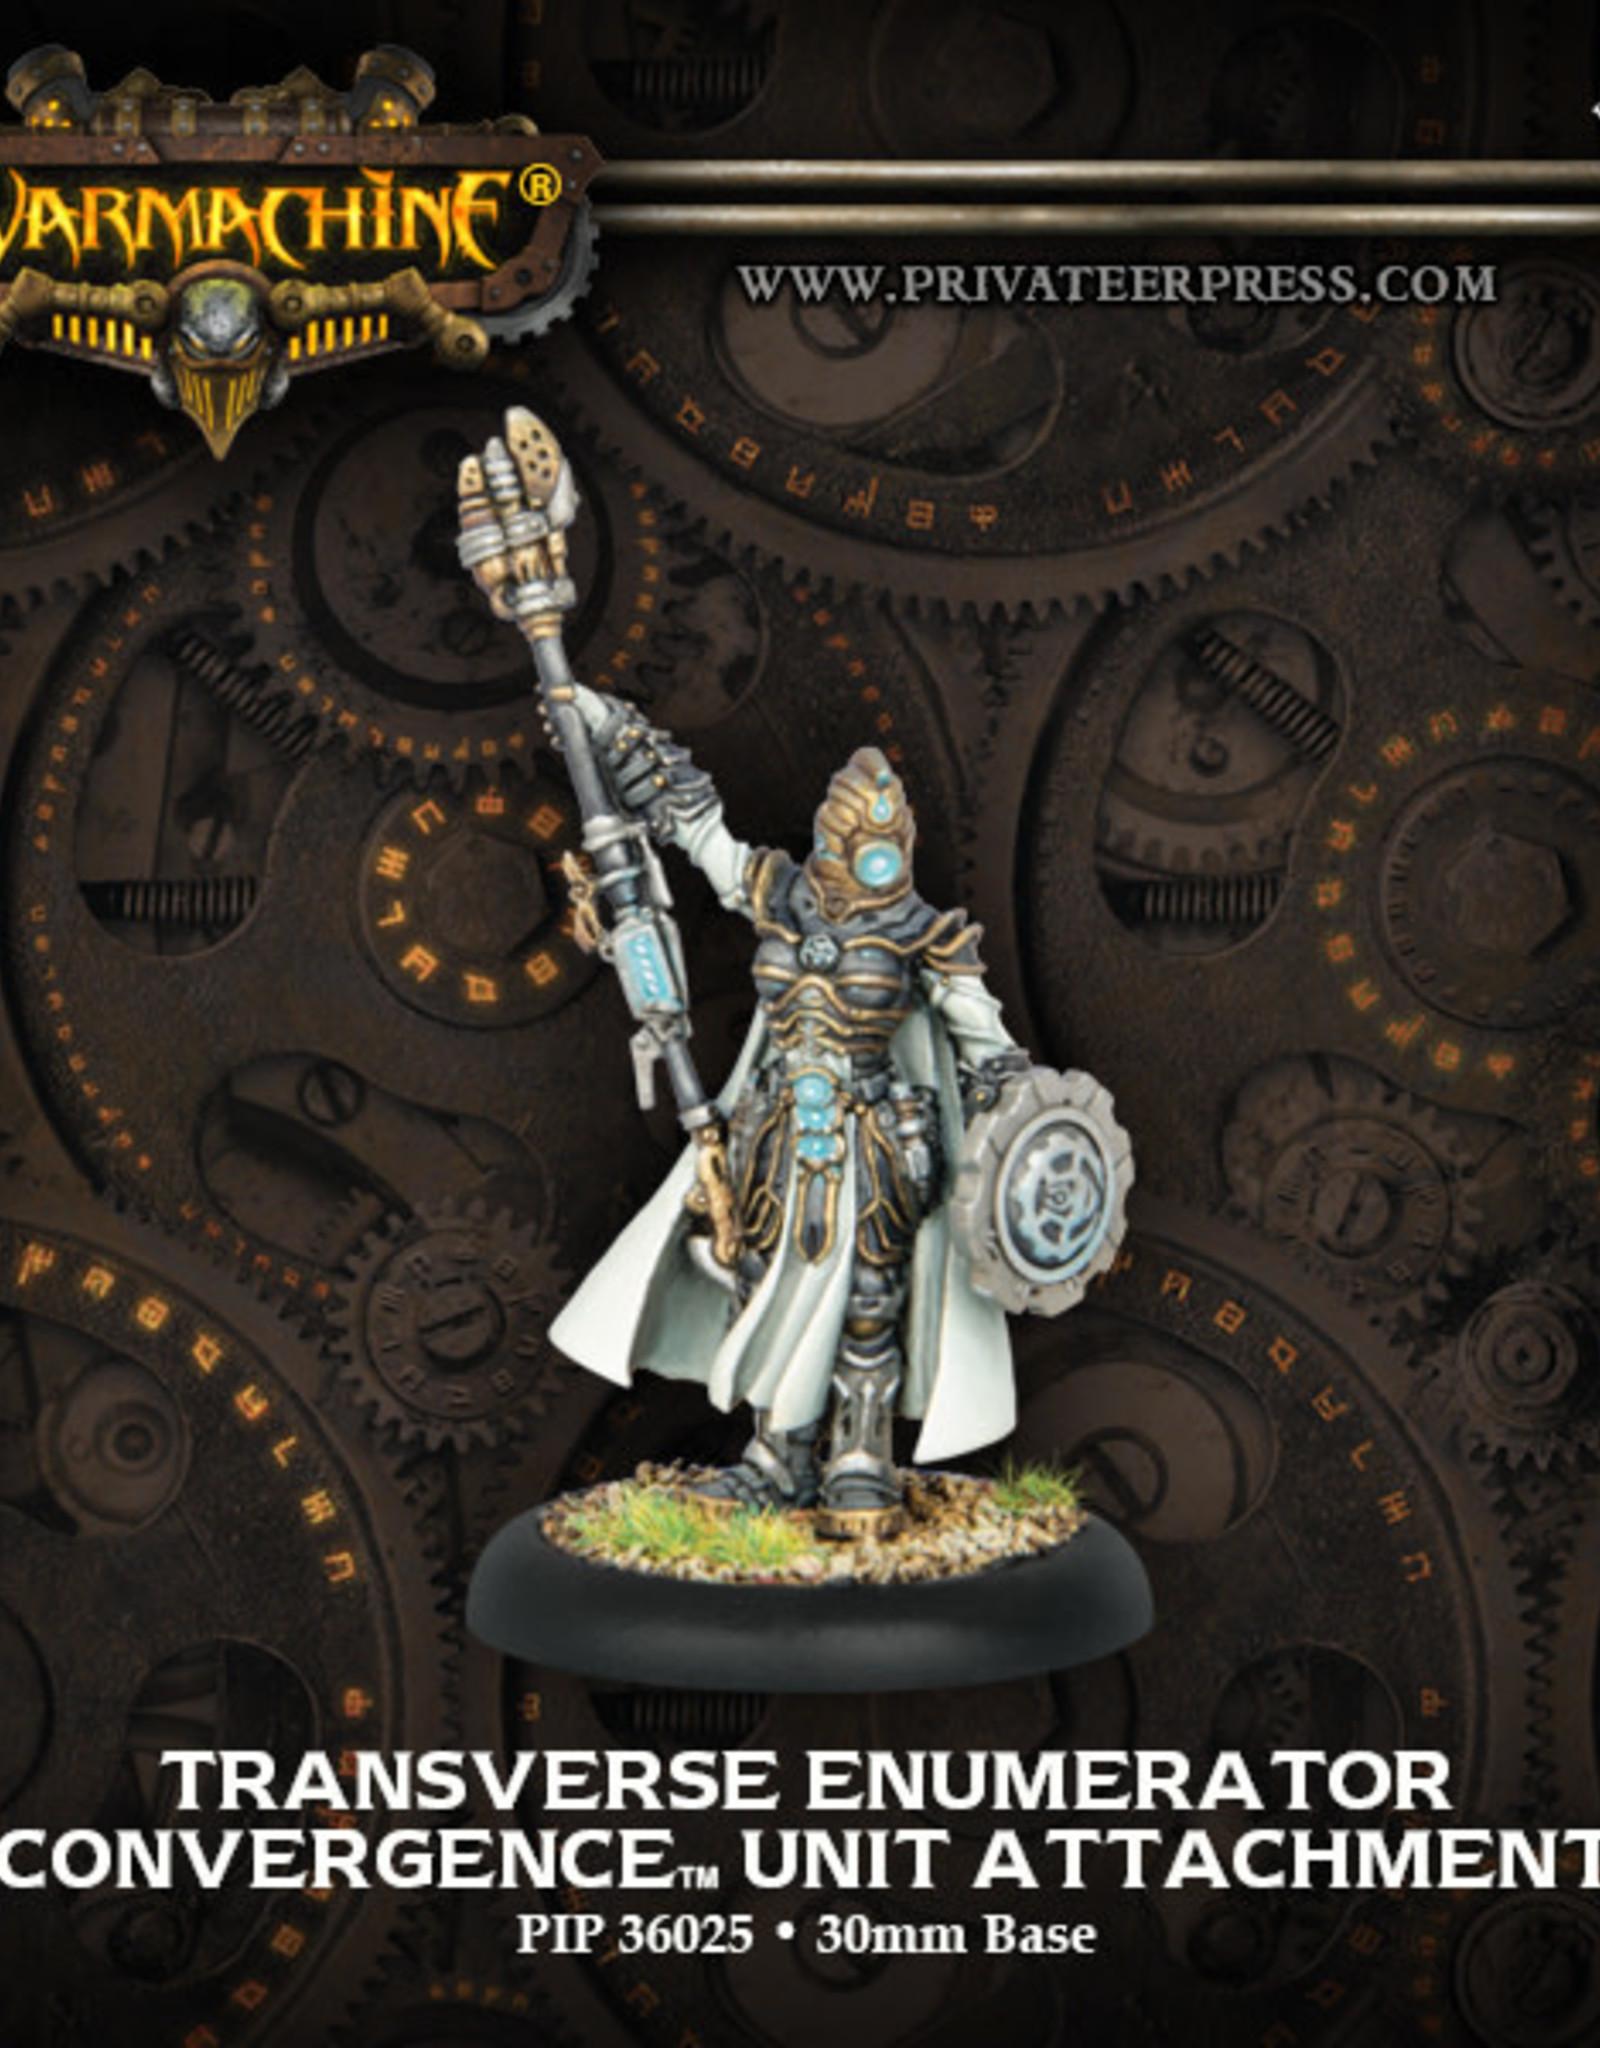 Warmachine Cyriss - Transverse Enumerator